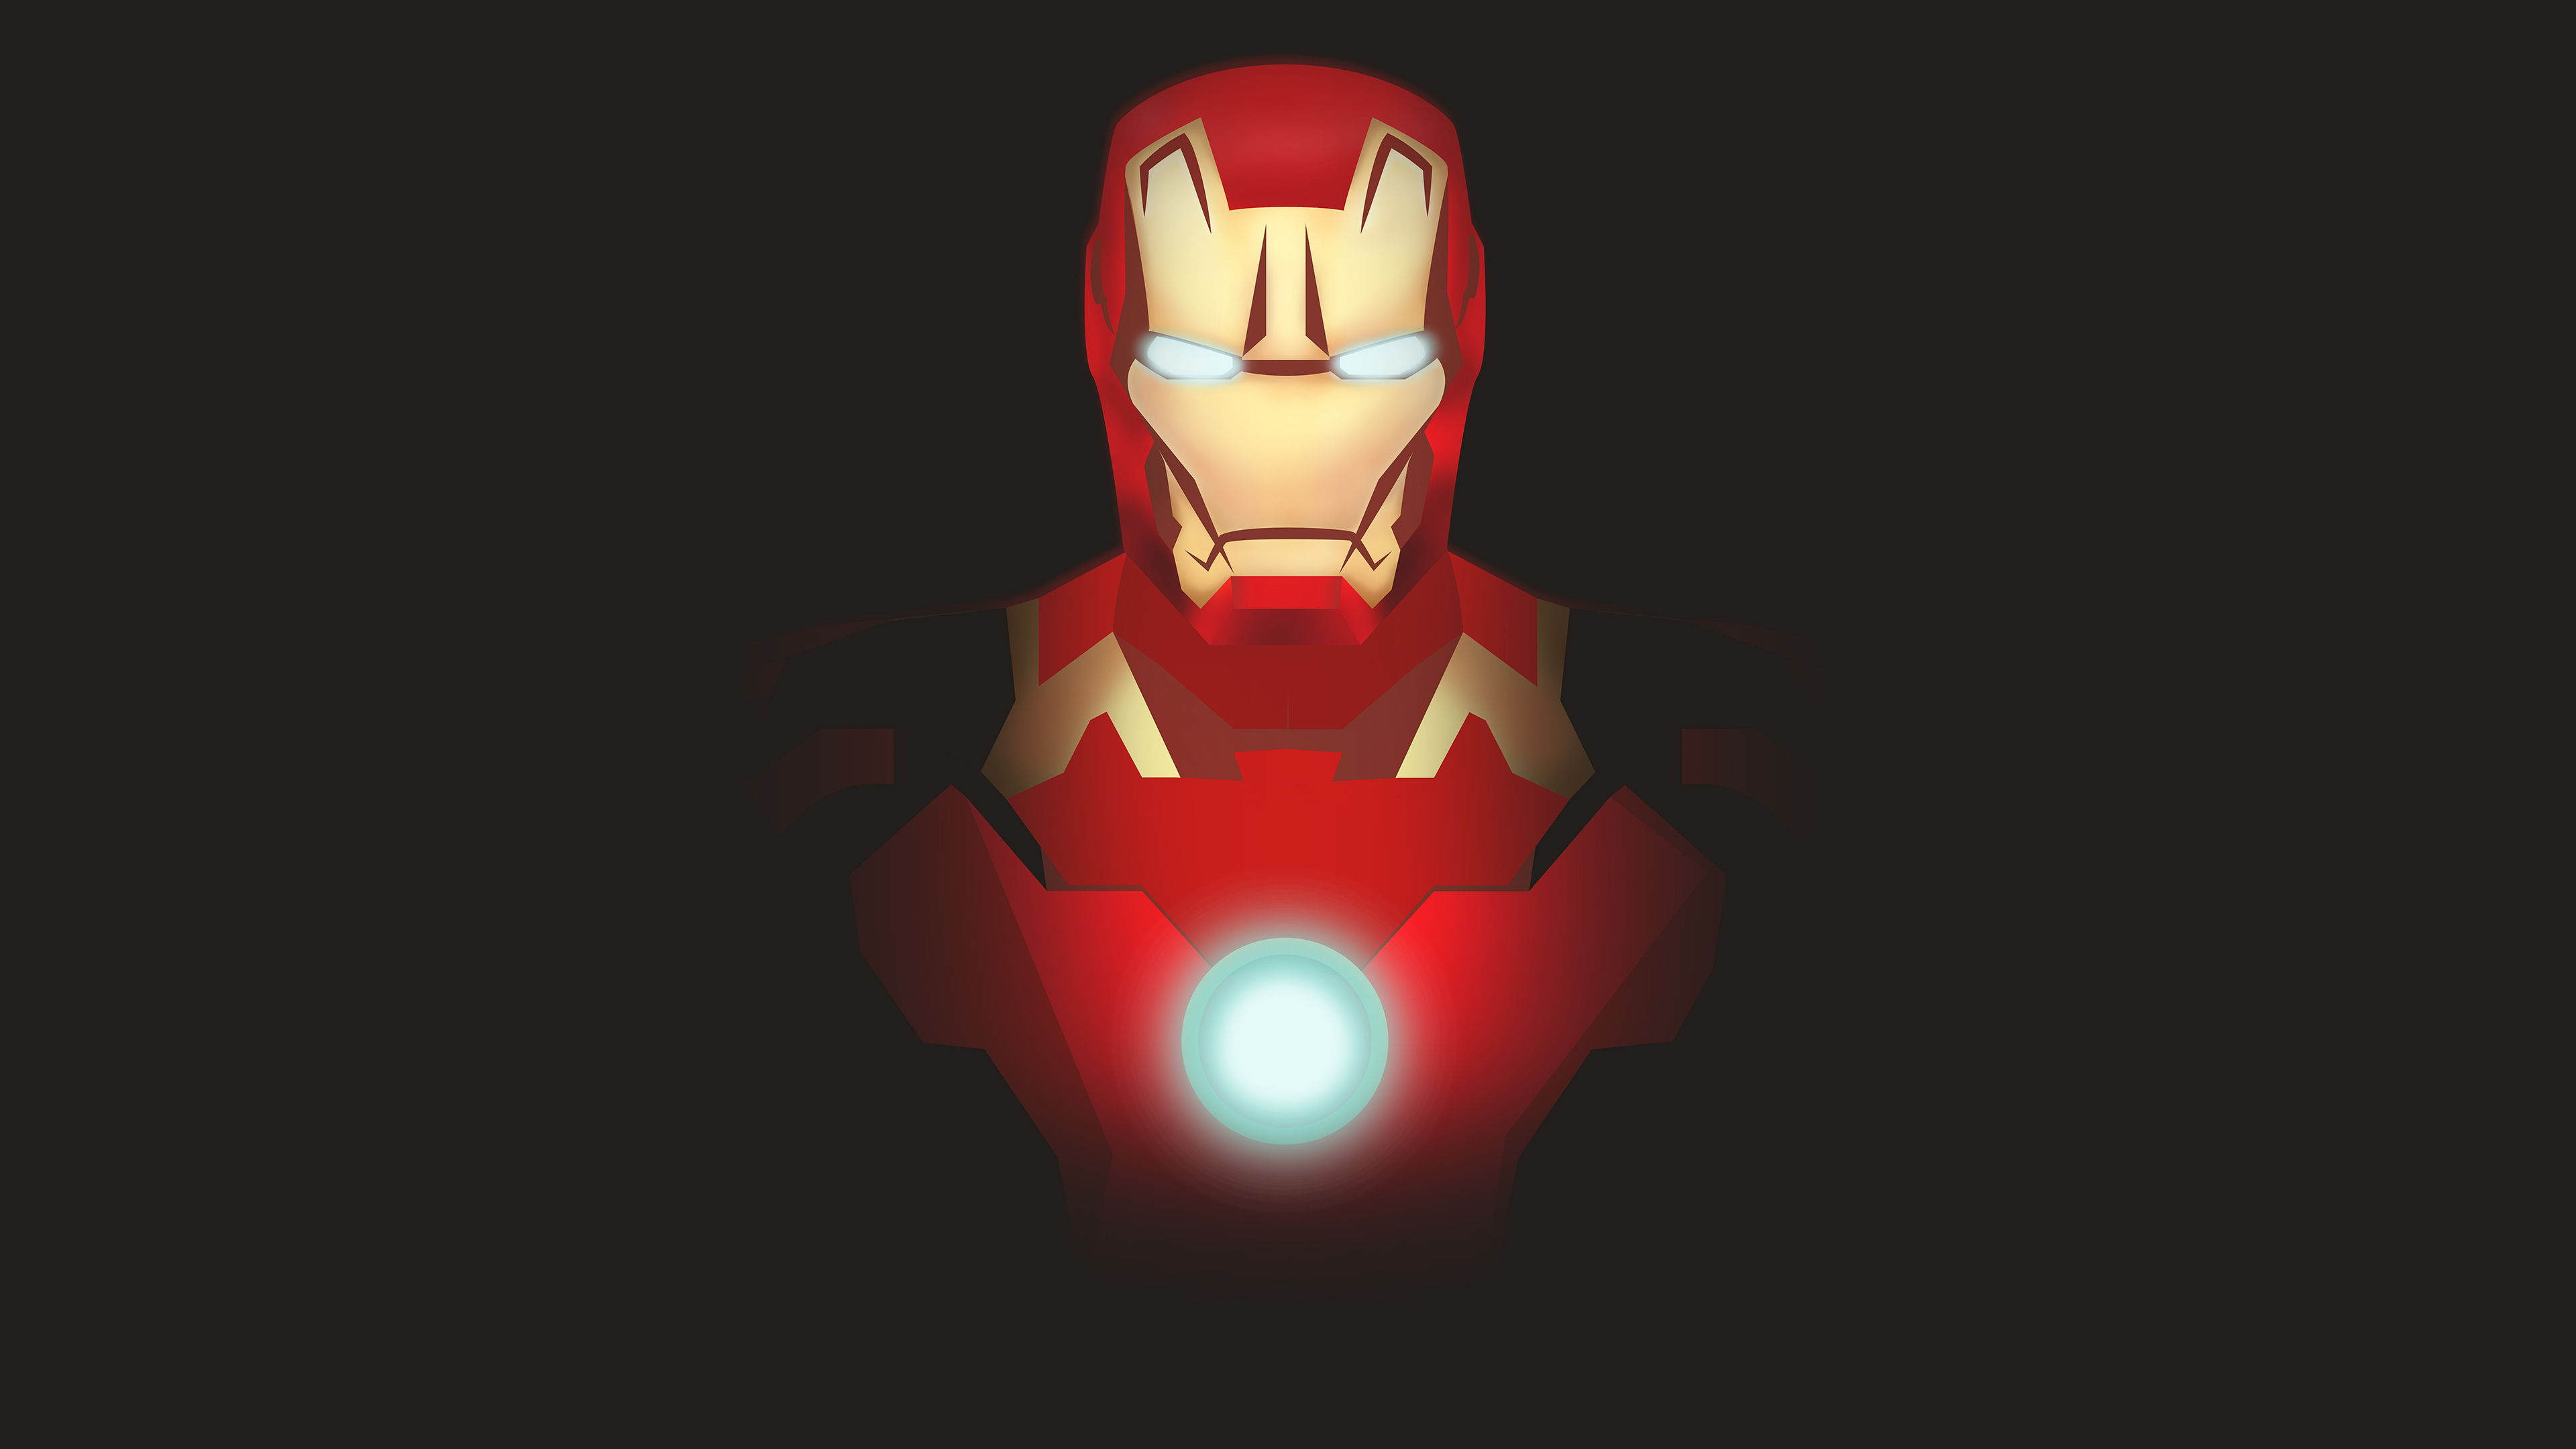 iron man illustration 1538786461 - Iron Man Illustration - superheroes wallpapers, iron man wallpapers, hd-wallpapers, digital art wallpapers, behance wallpapers, artwork wallpapers, artist wallpapers, 4k-wallpapers